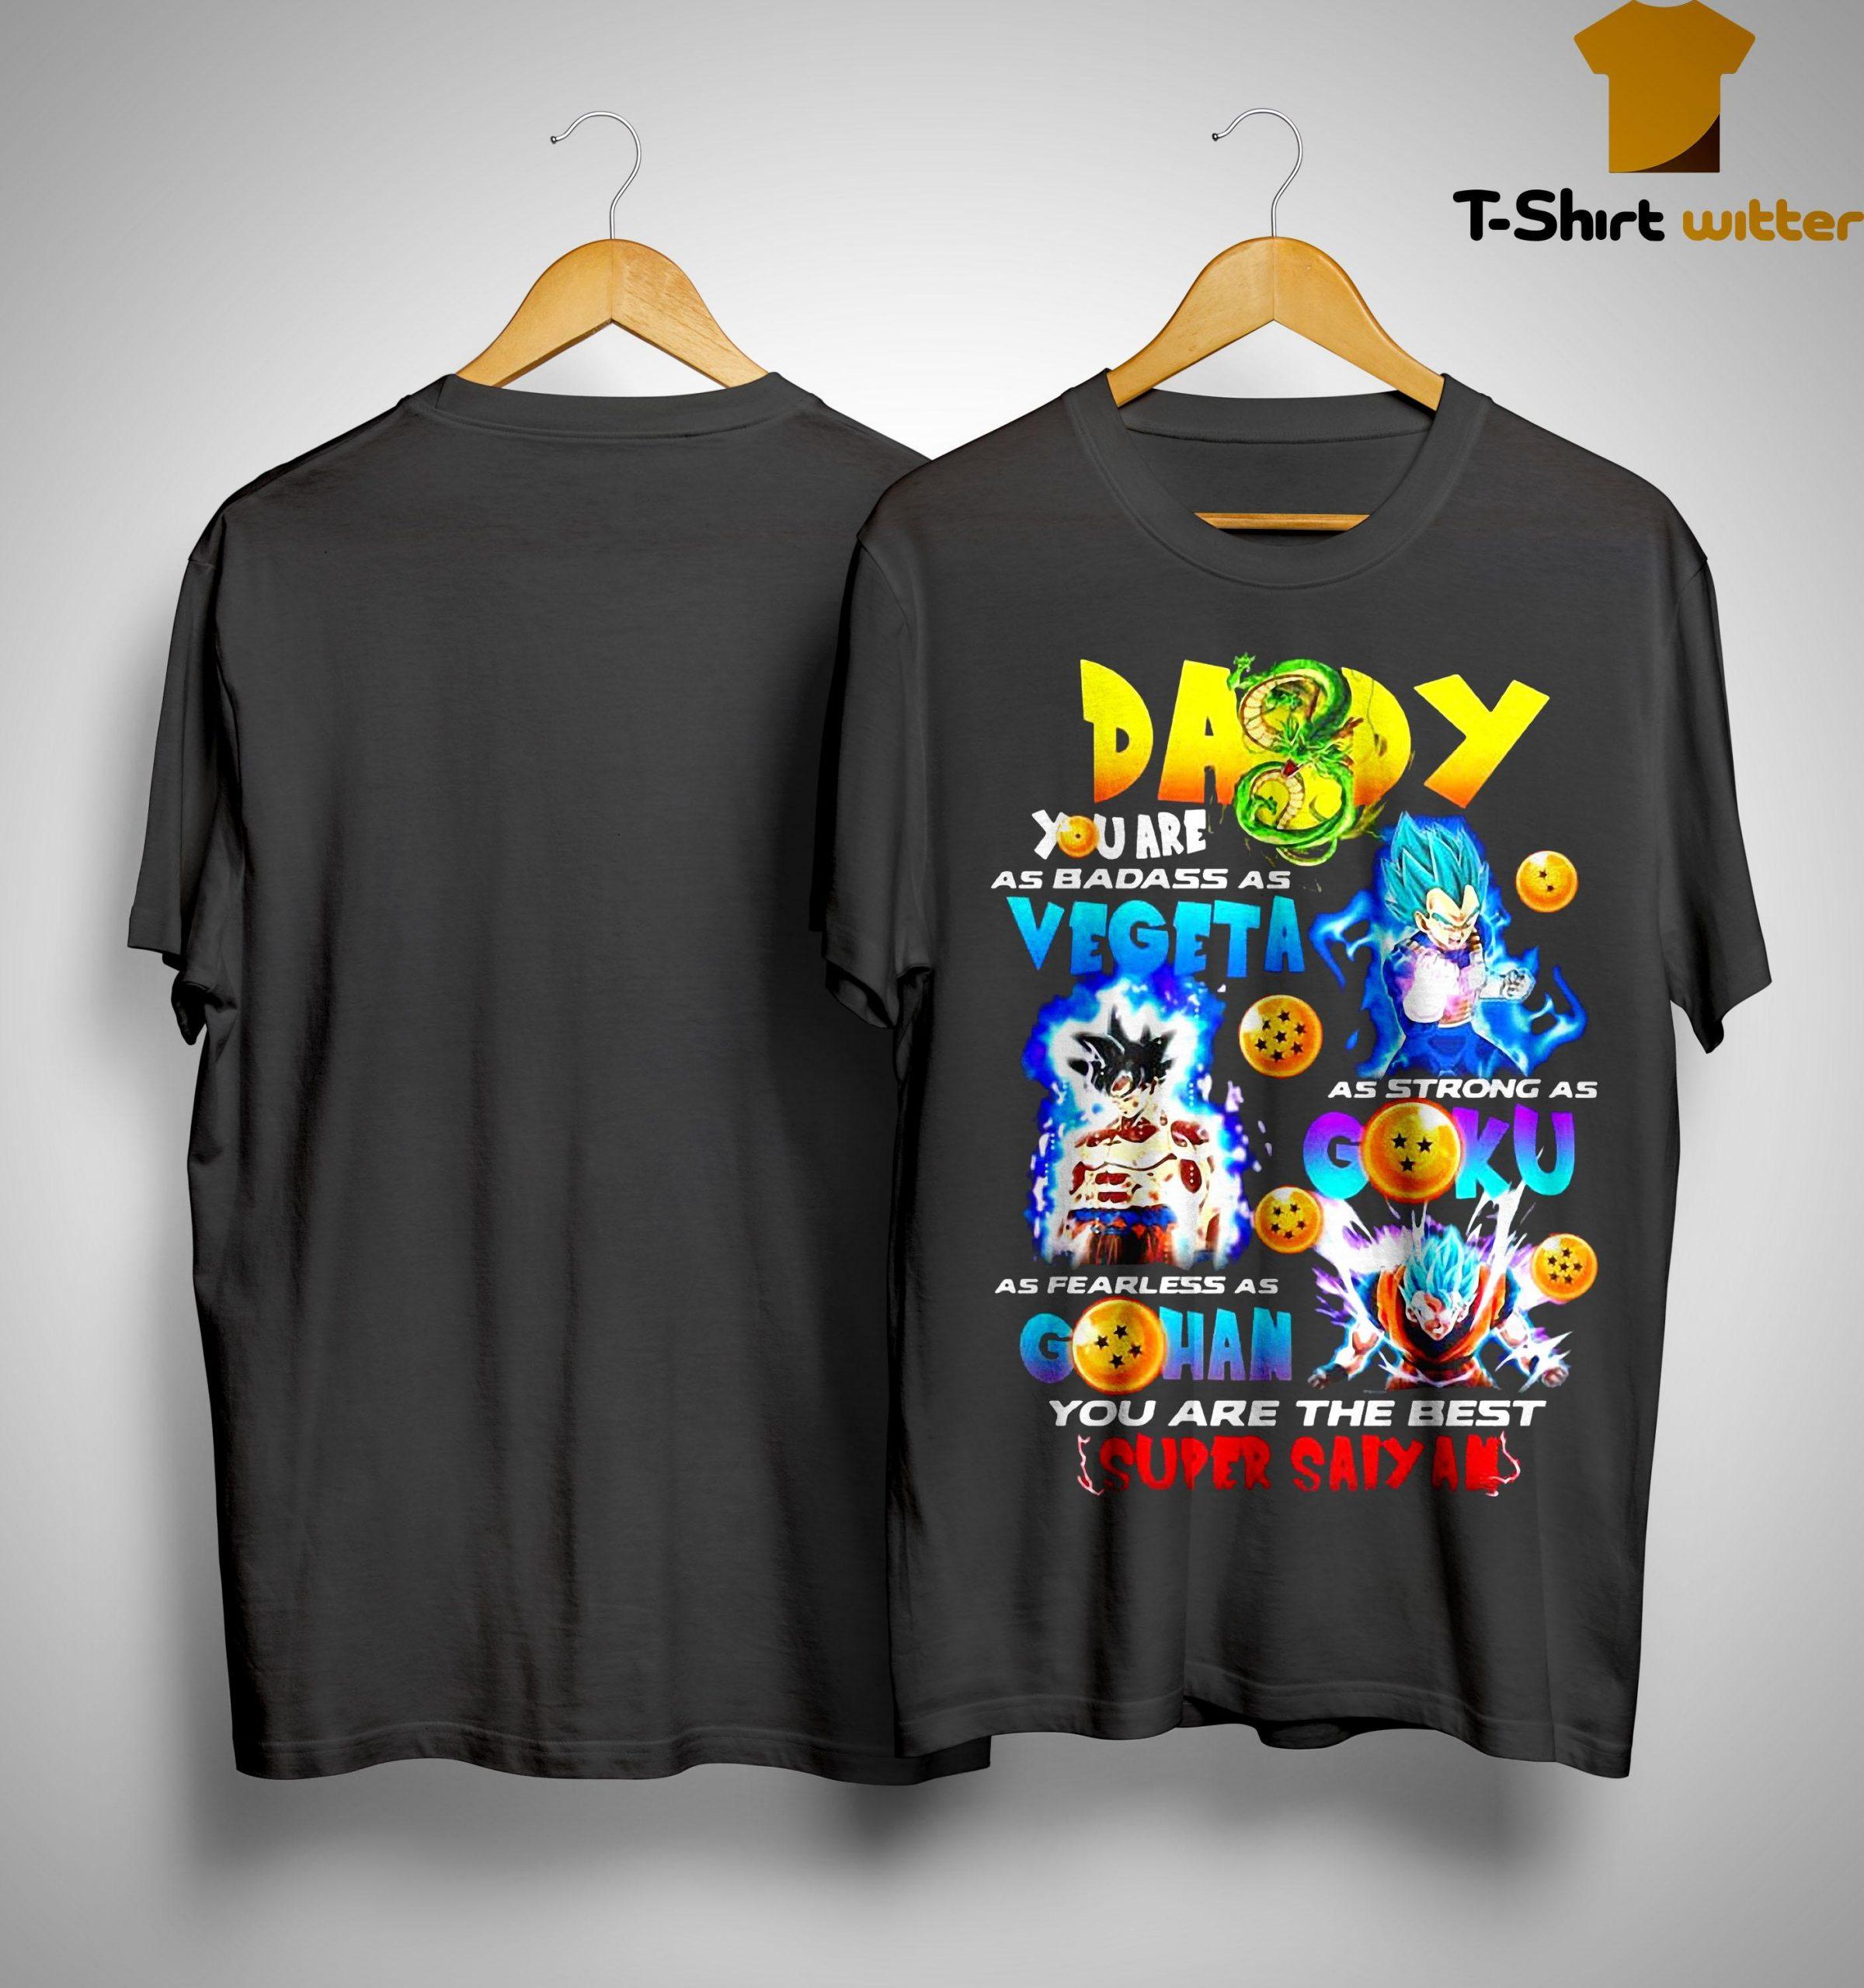 Daddy You Are As Badass As Vegeta As Strong As Goku Shirt